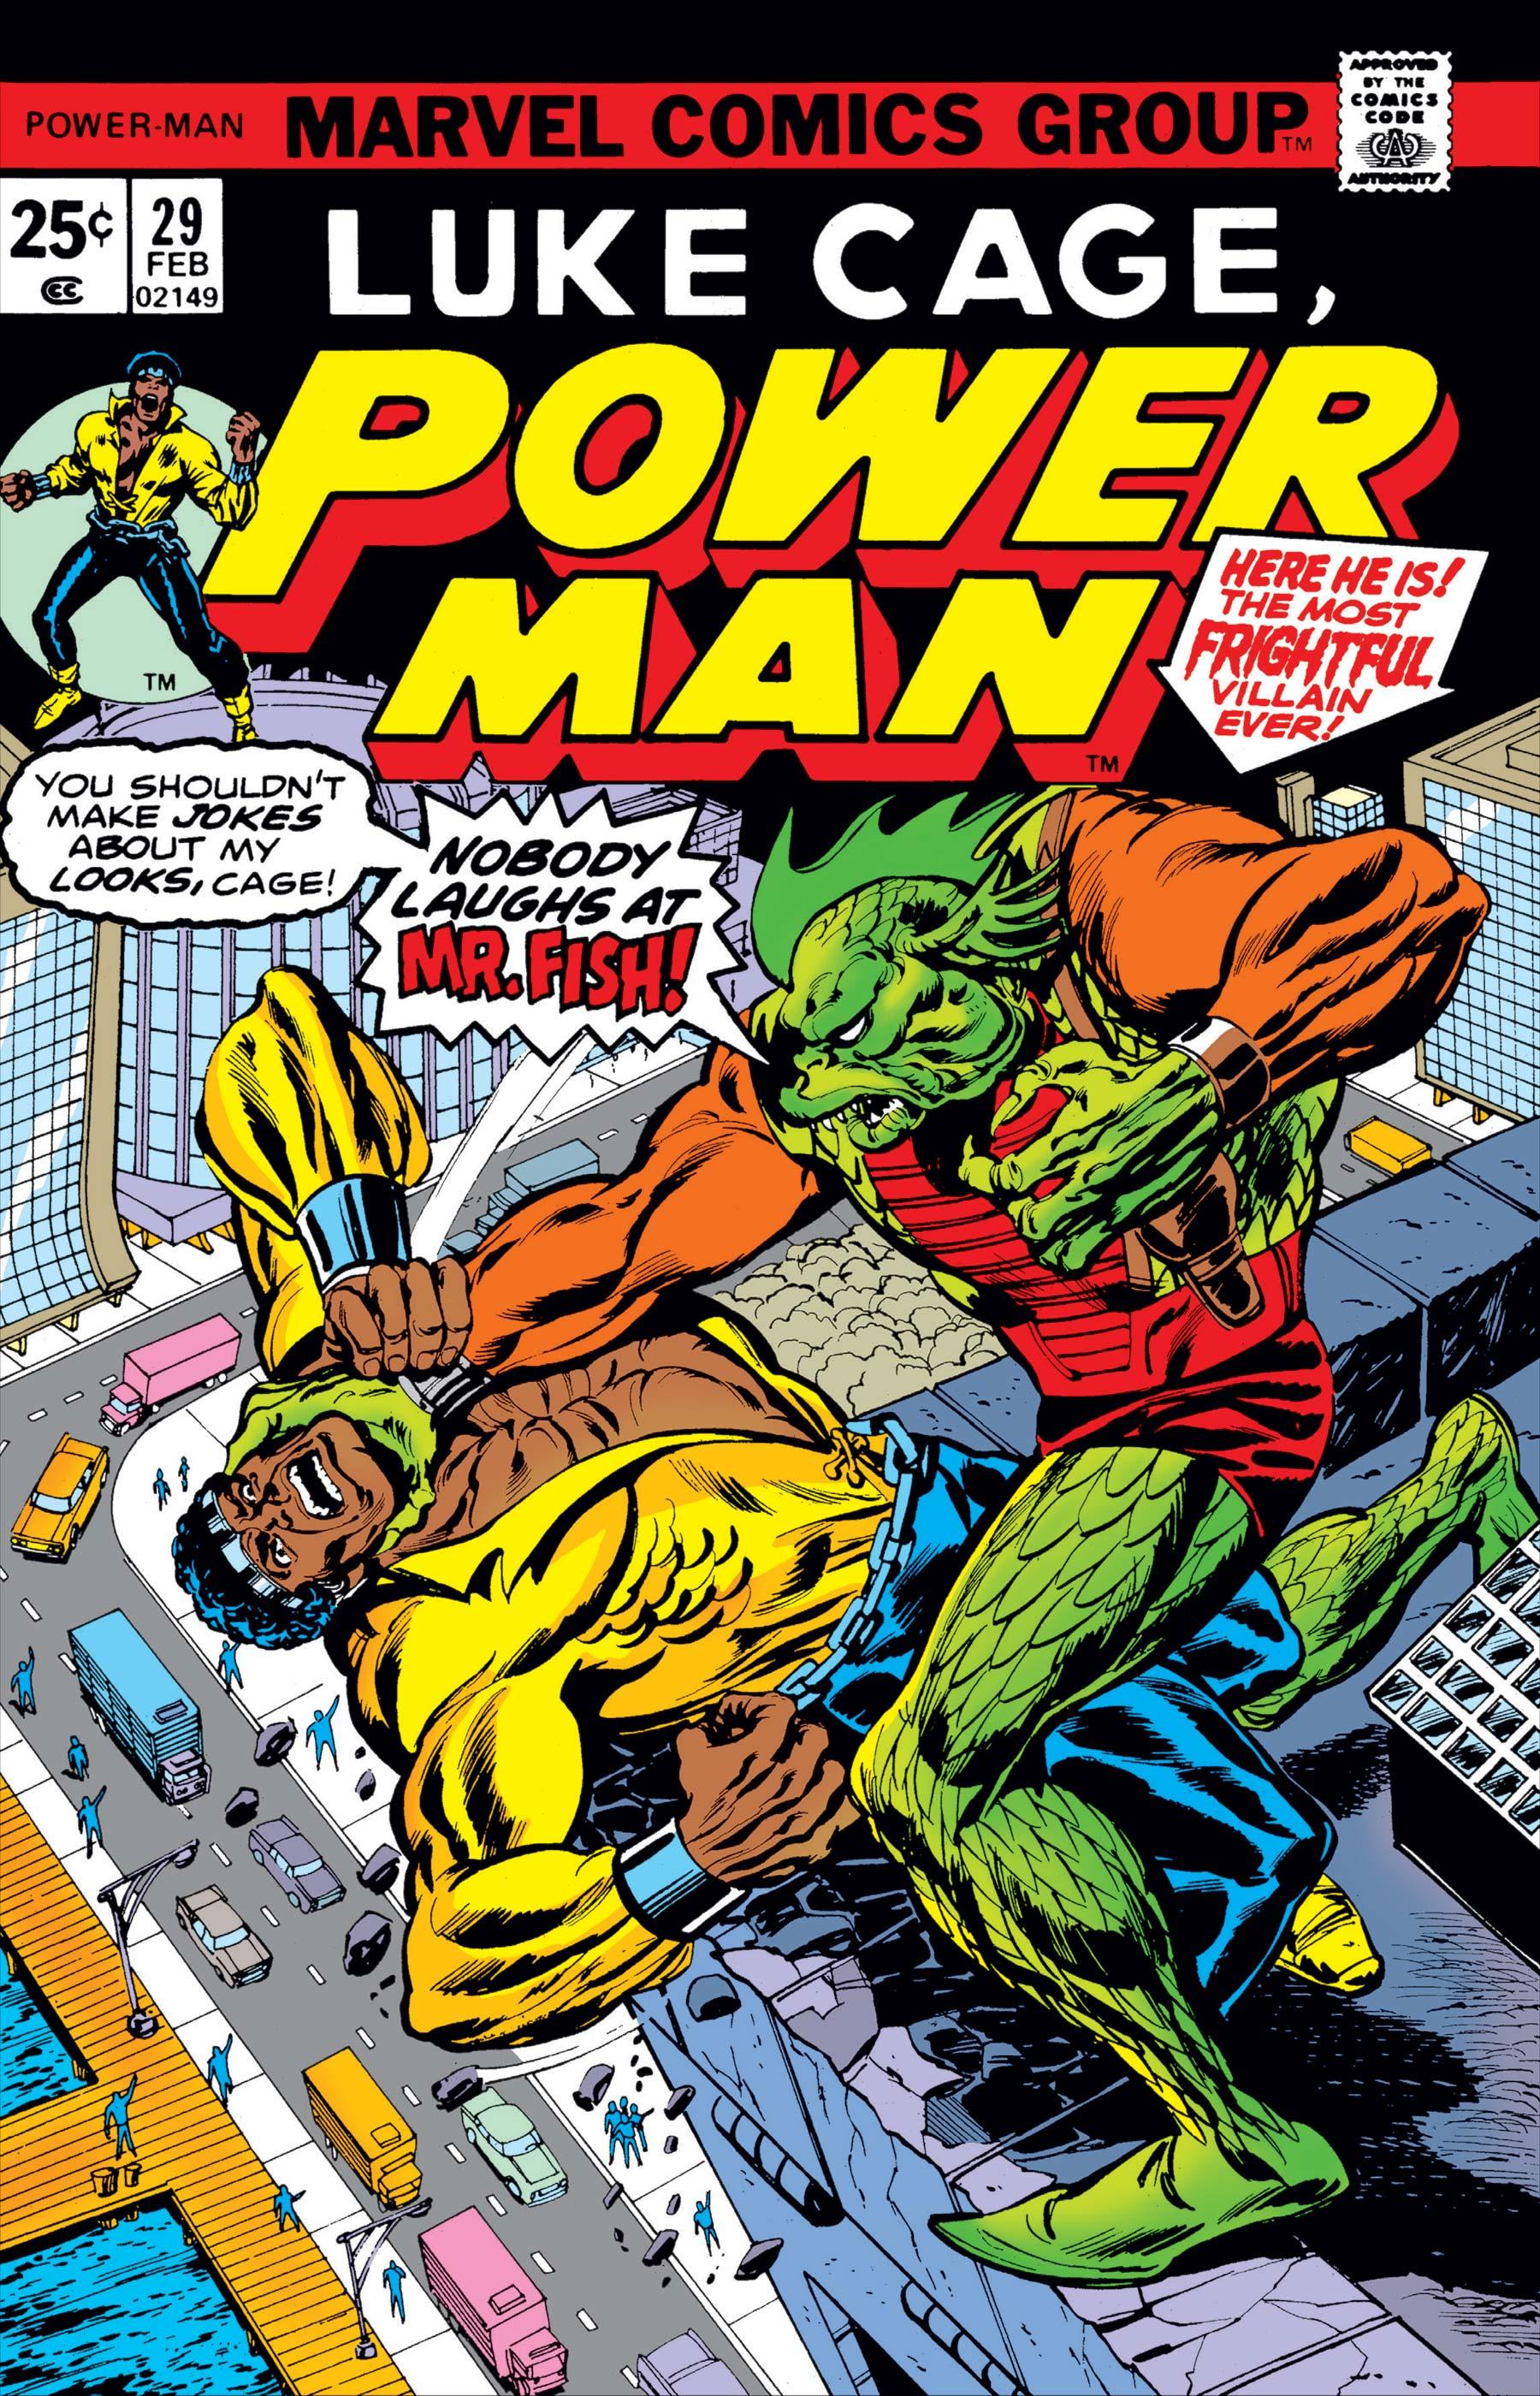 Power Man (1974) #29